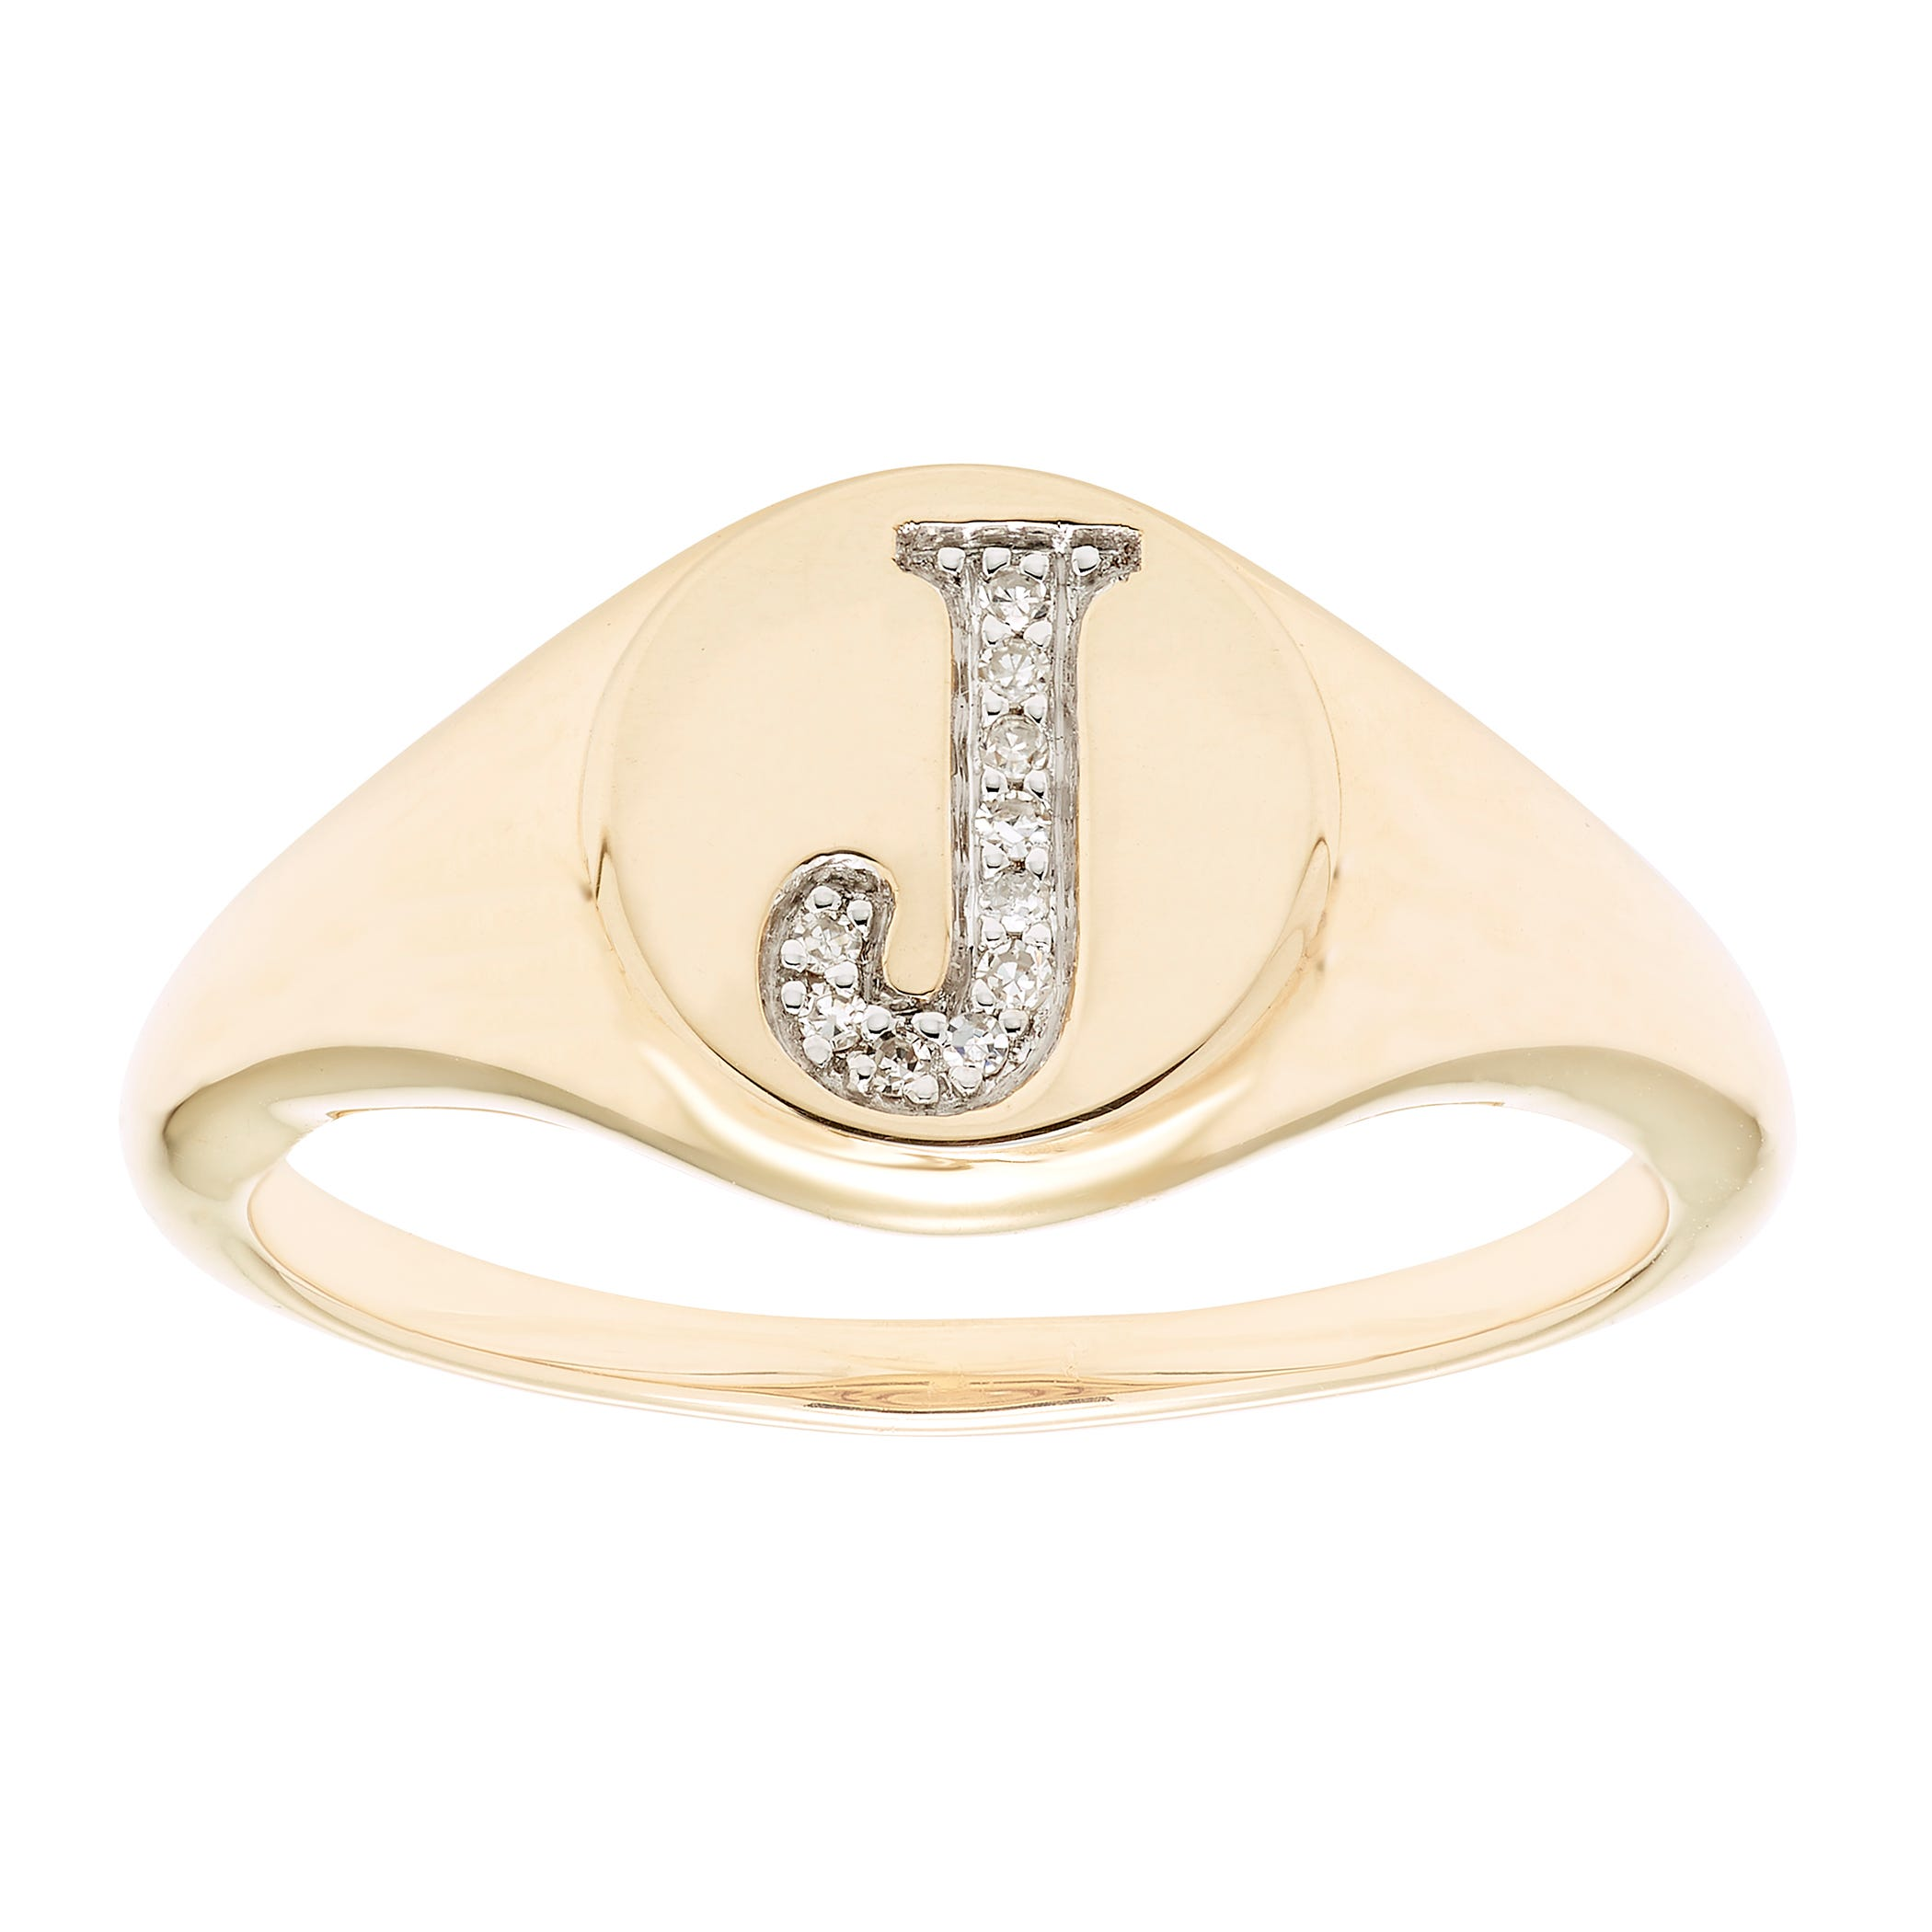 Diamond Initial J Signet Ring in 14k Yellow Gold